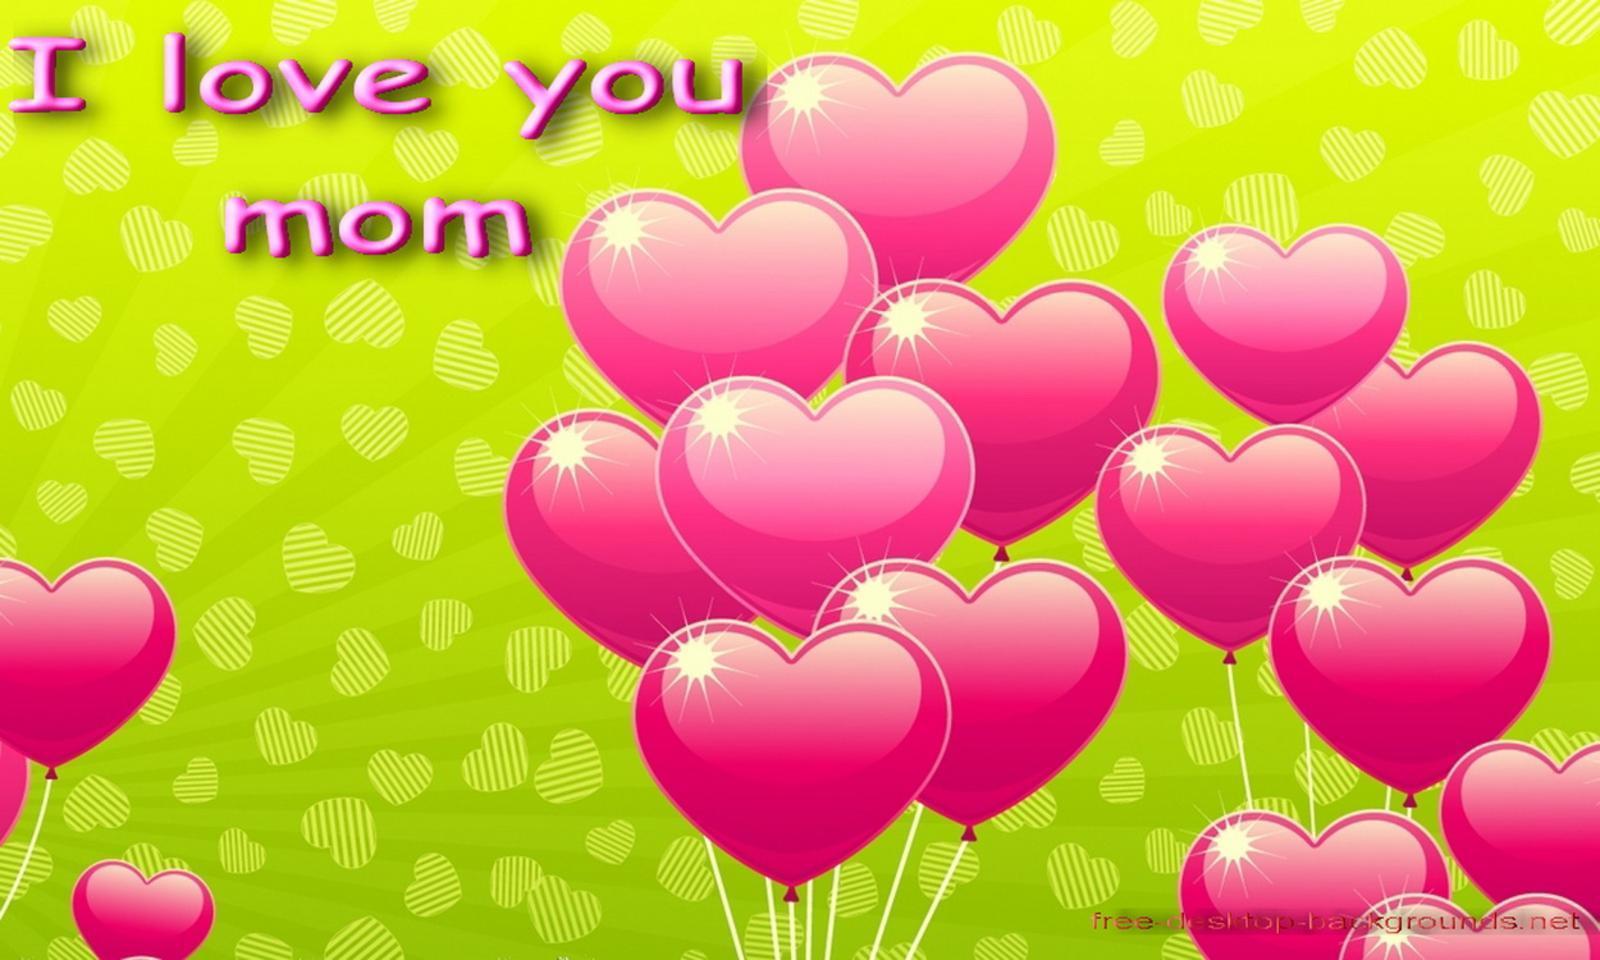 A mothers love 4 brandi love 8